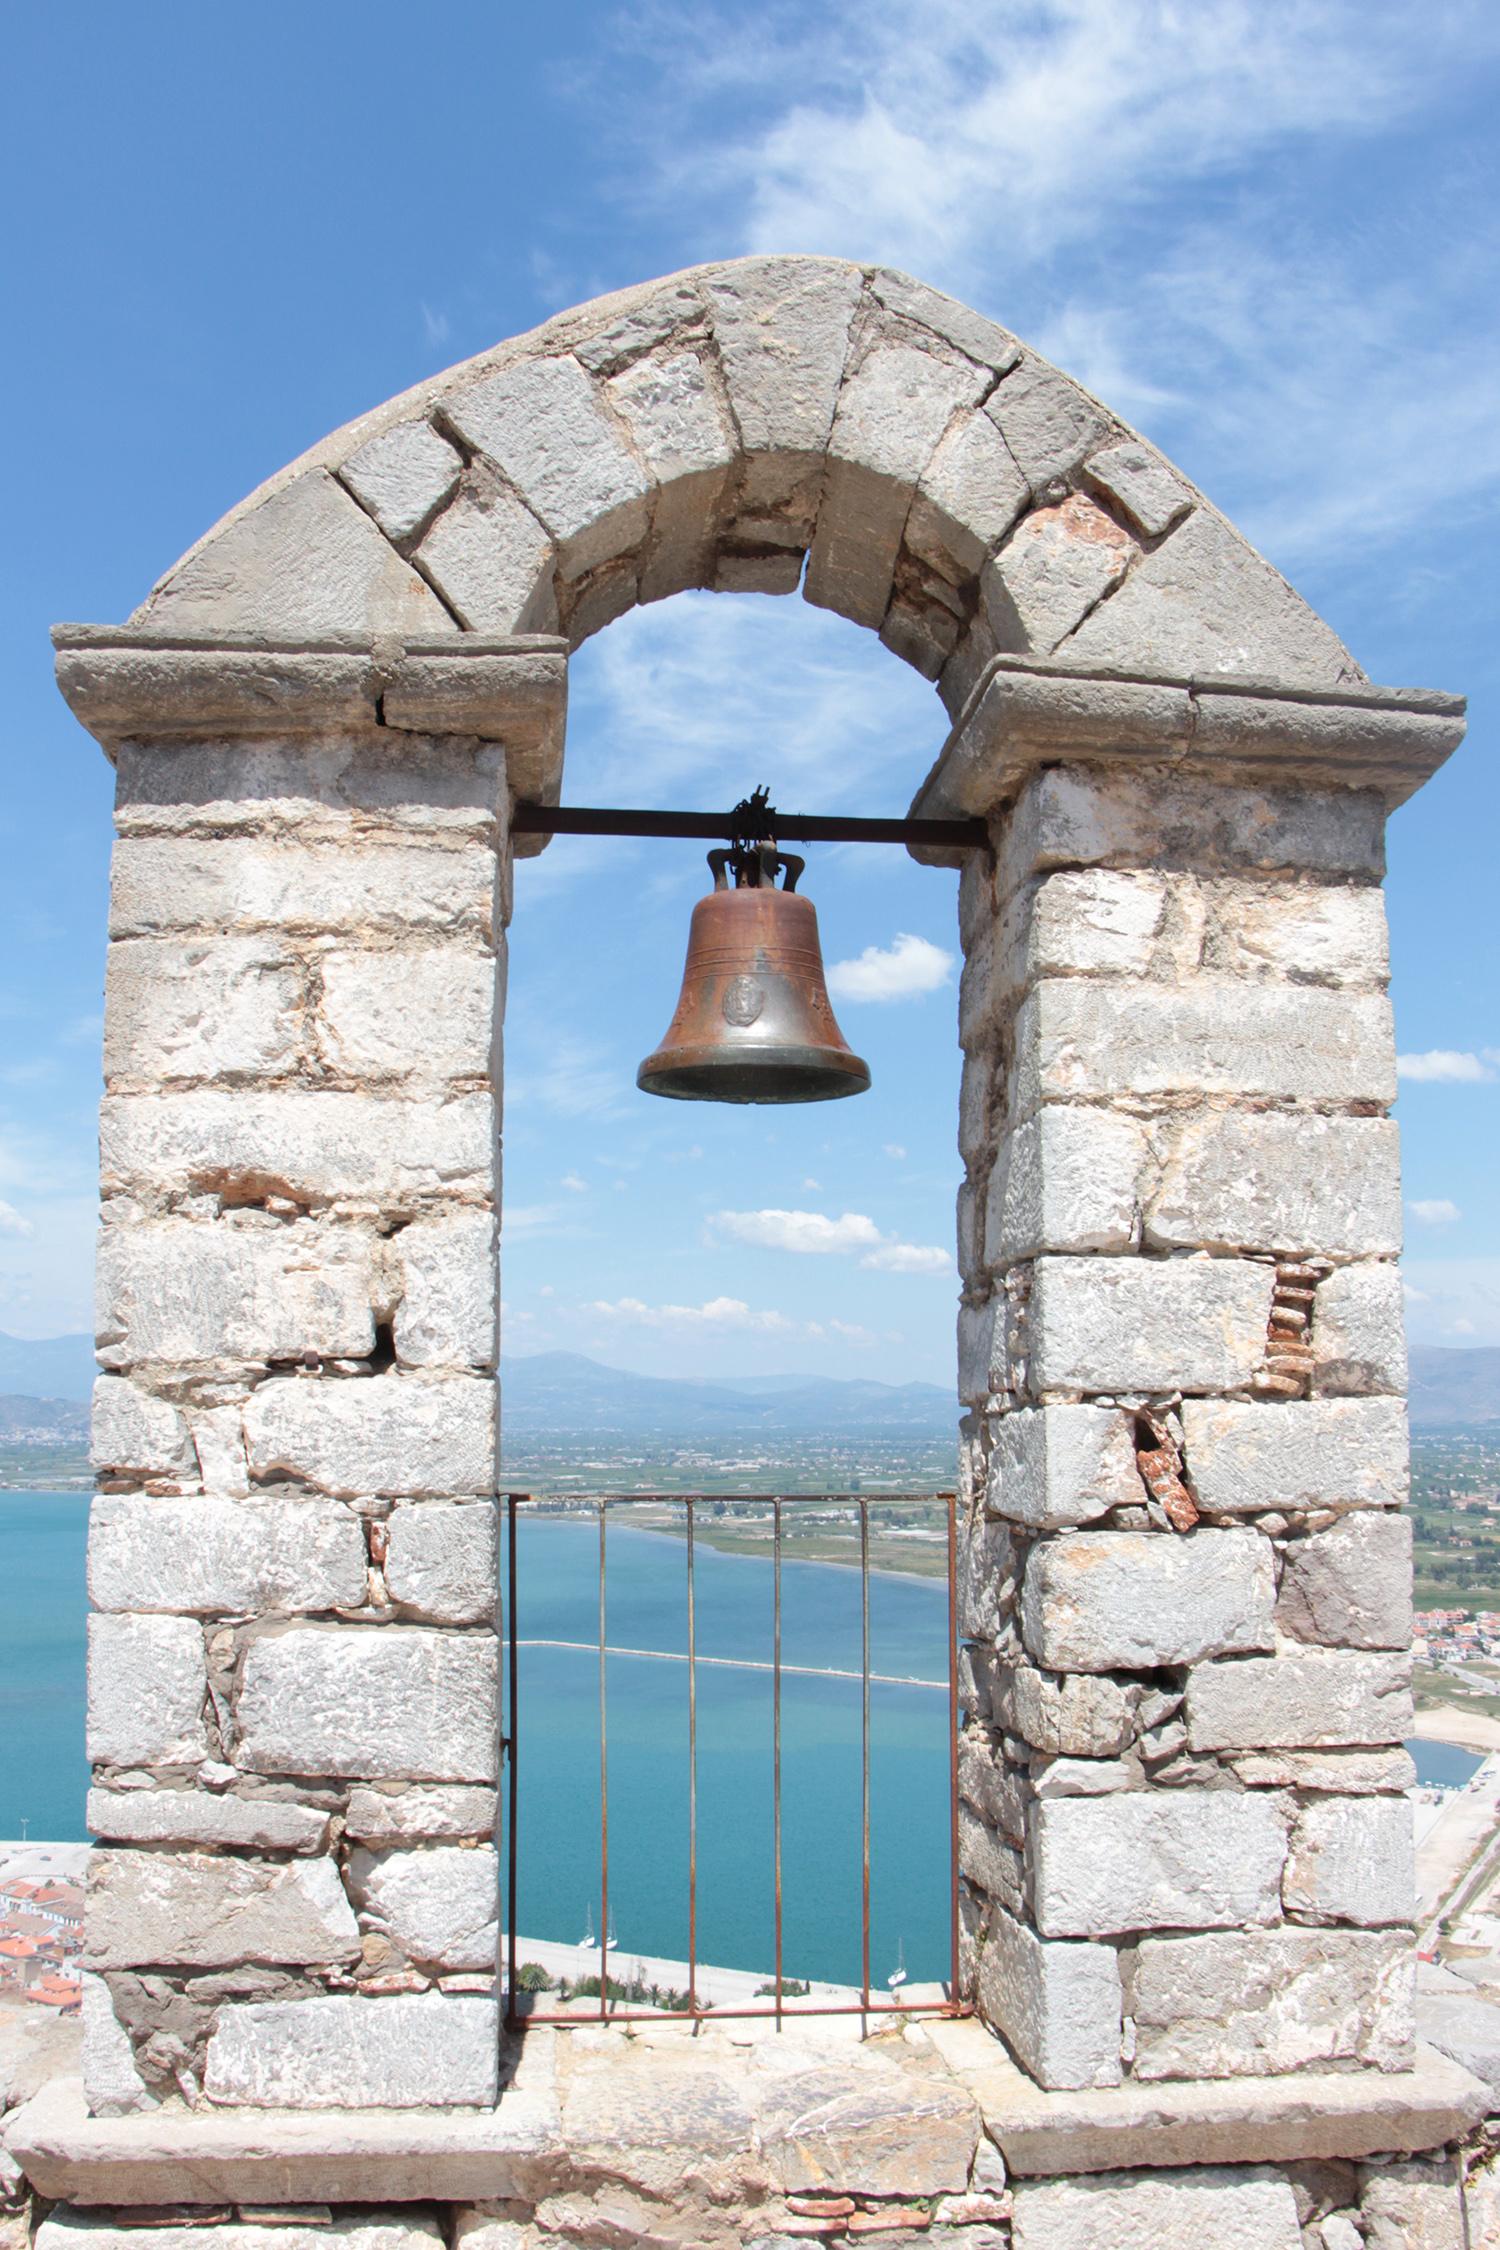 nafplio palamidi bell